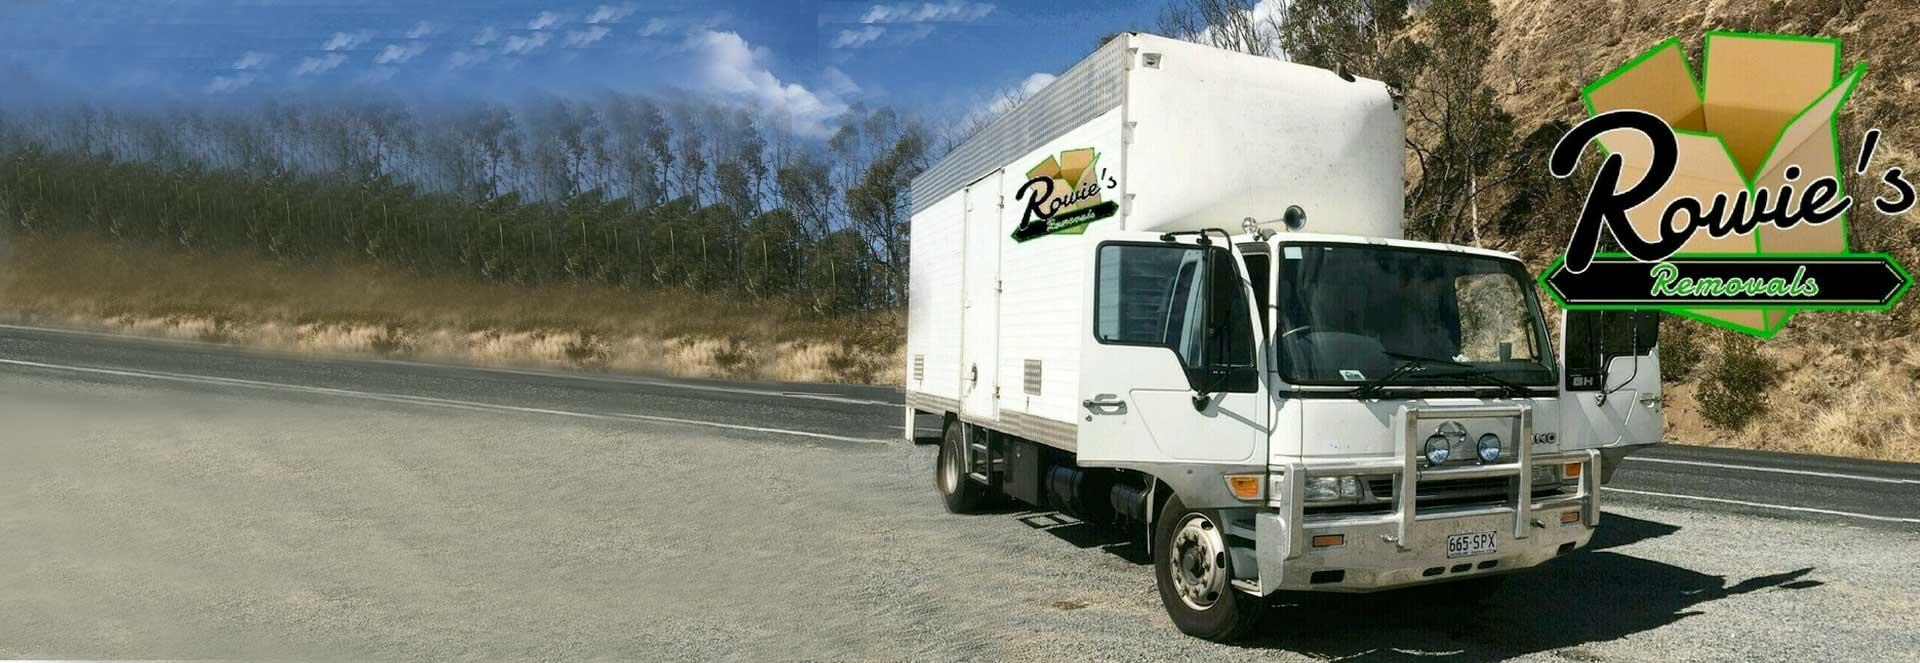 removal-companies-toowoomba